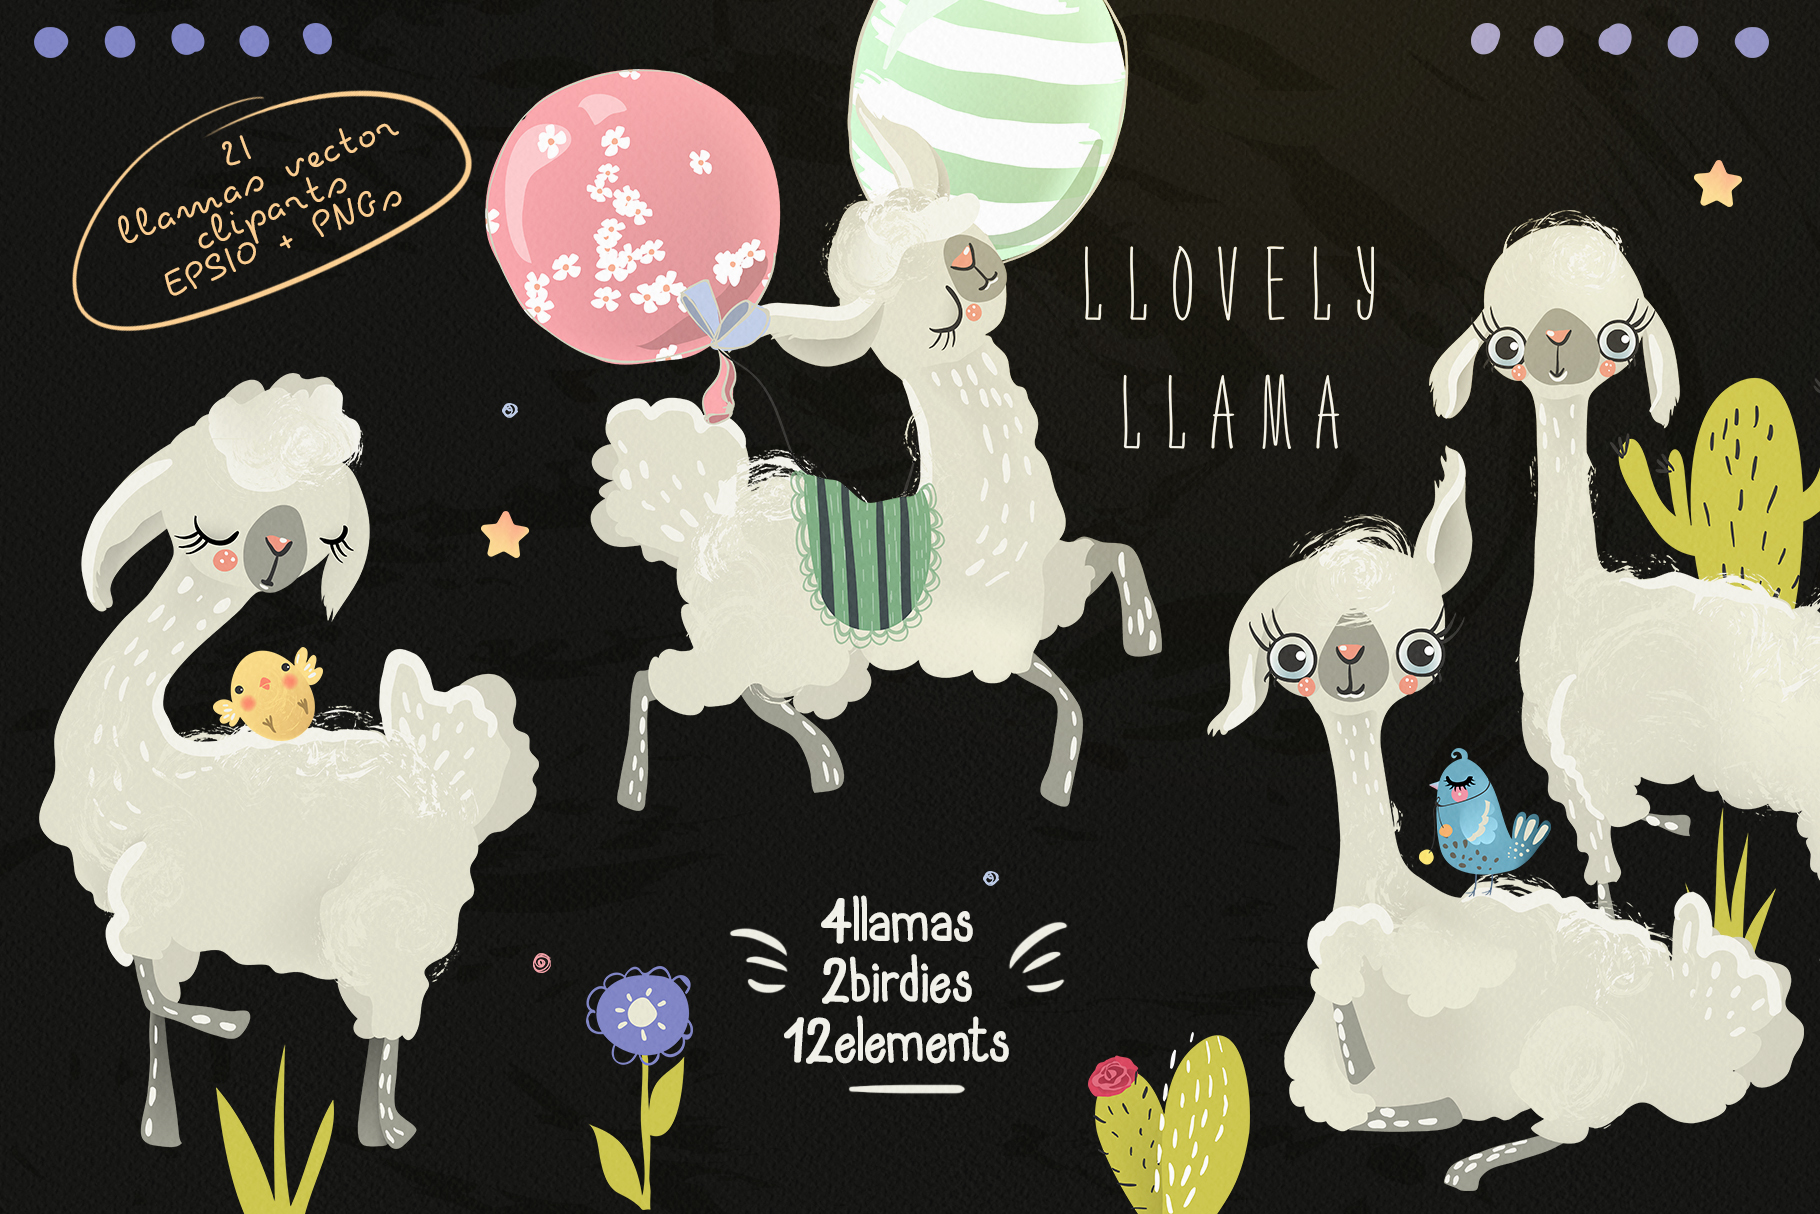 Llovely Llamas example image 2